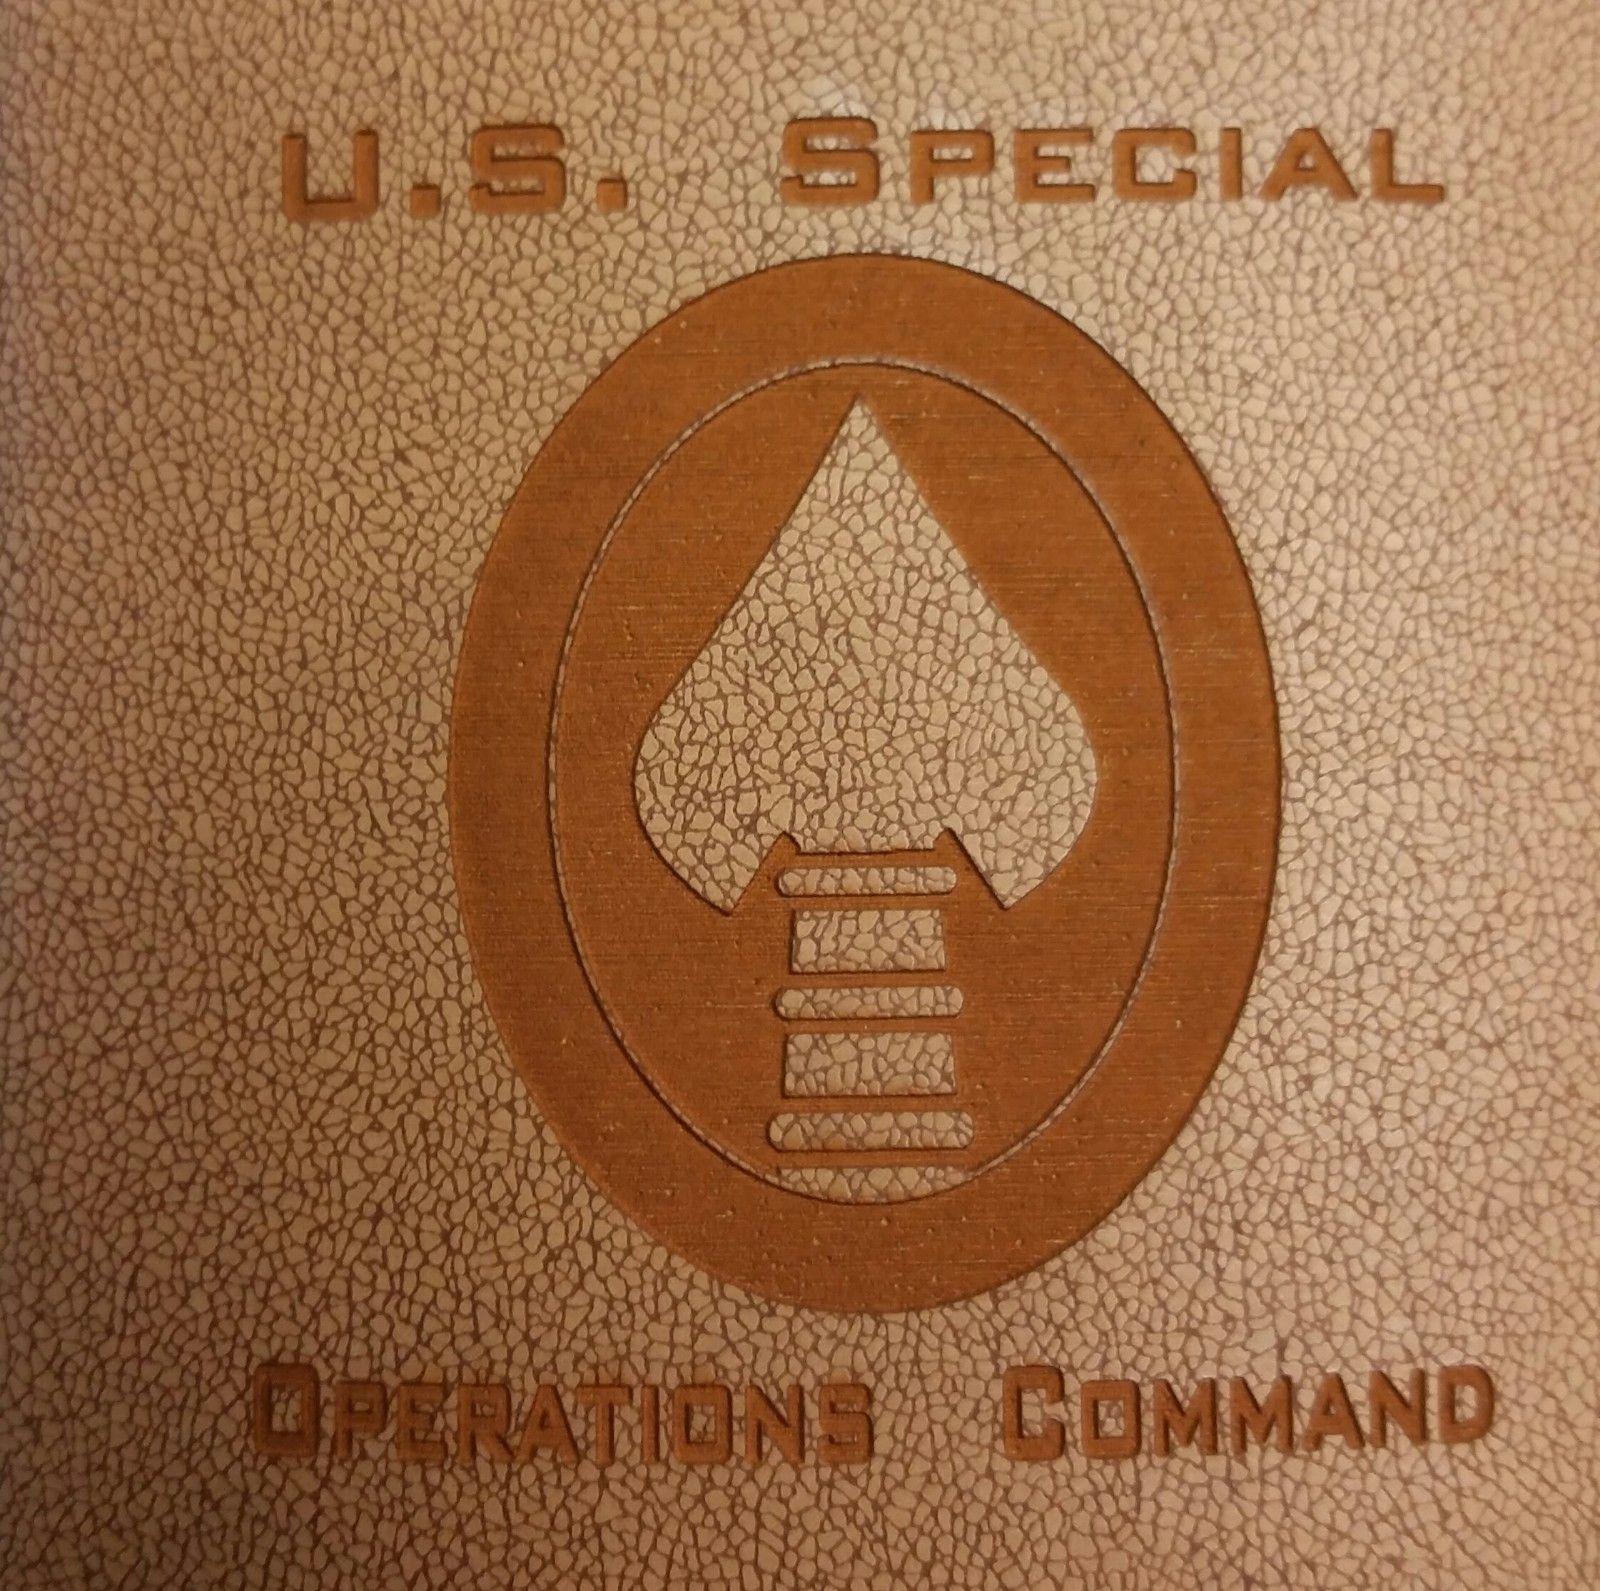 Ussocom Socom Dod Us Special Operations and 50 similar items